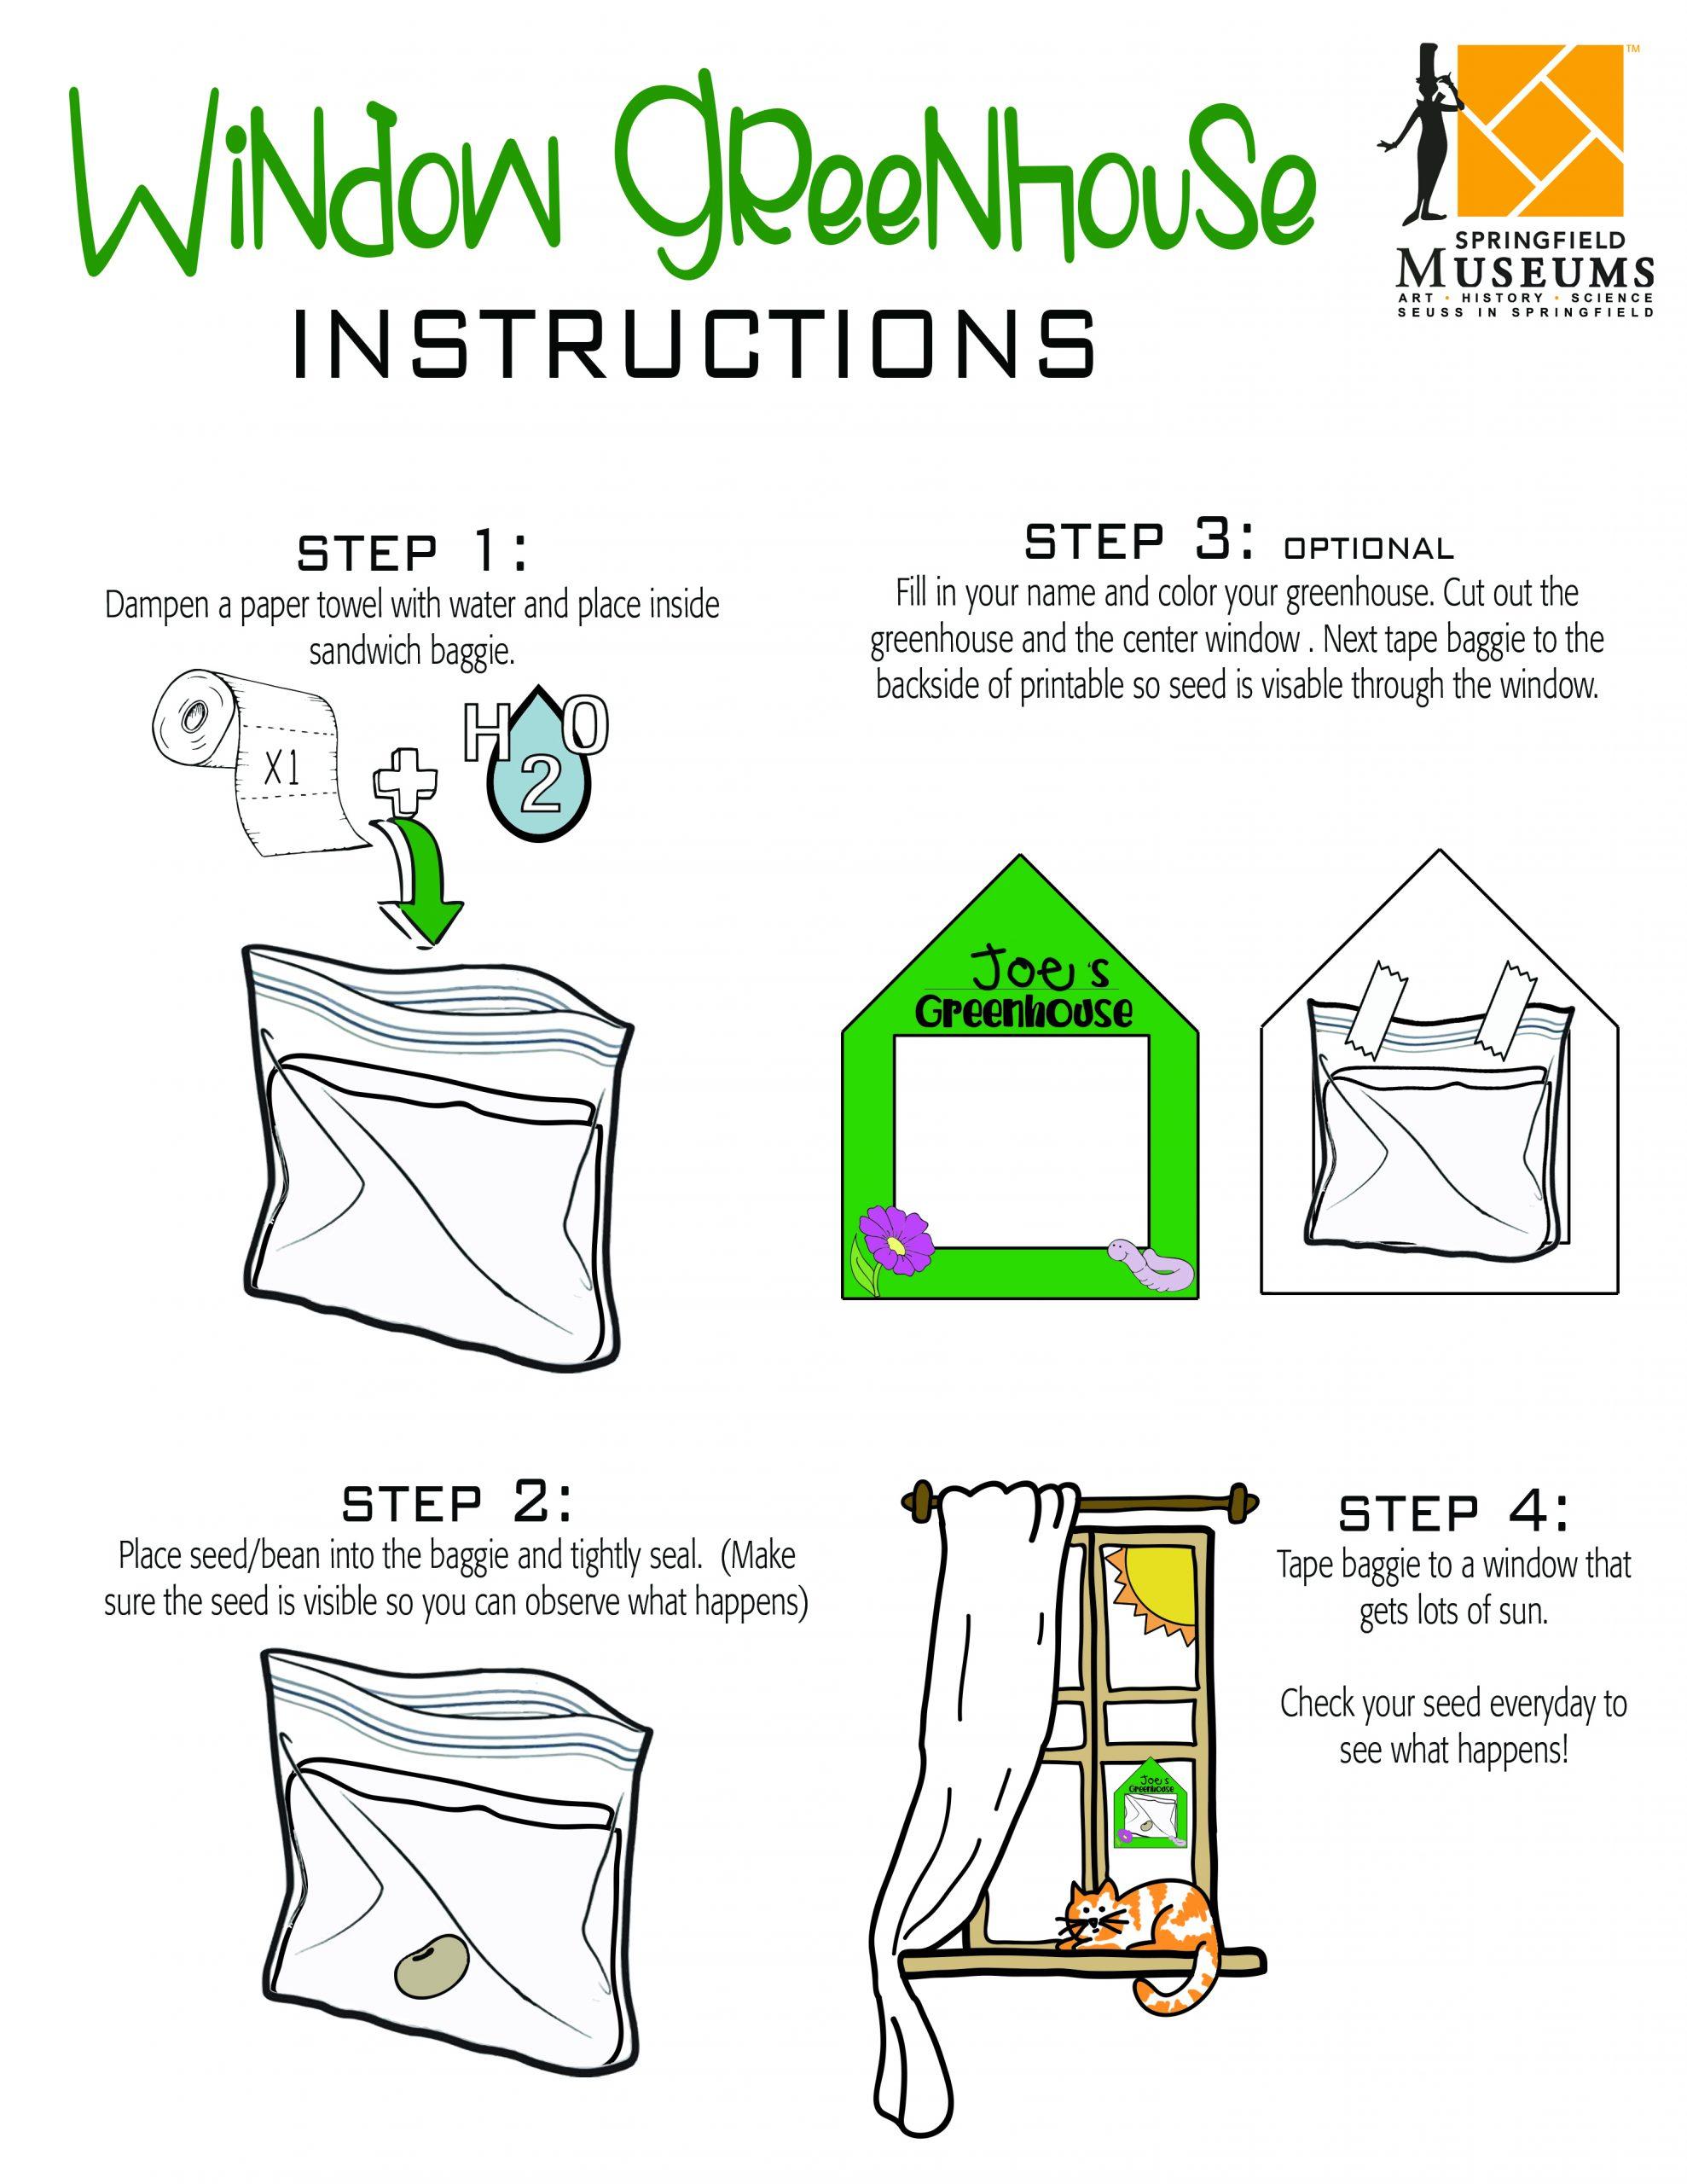 Window Green House Instructions